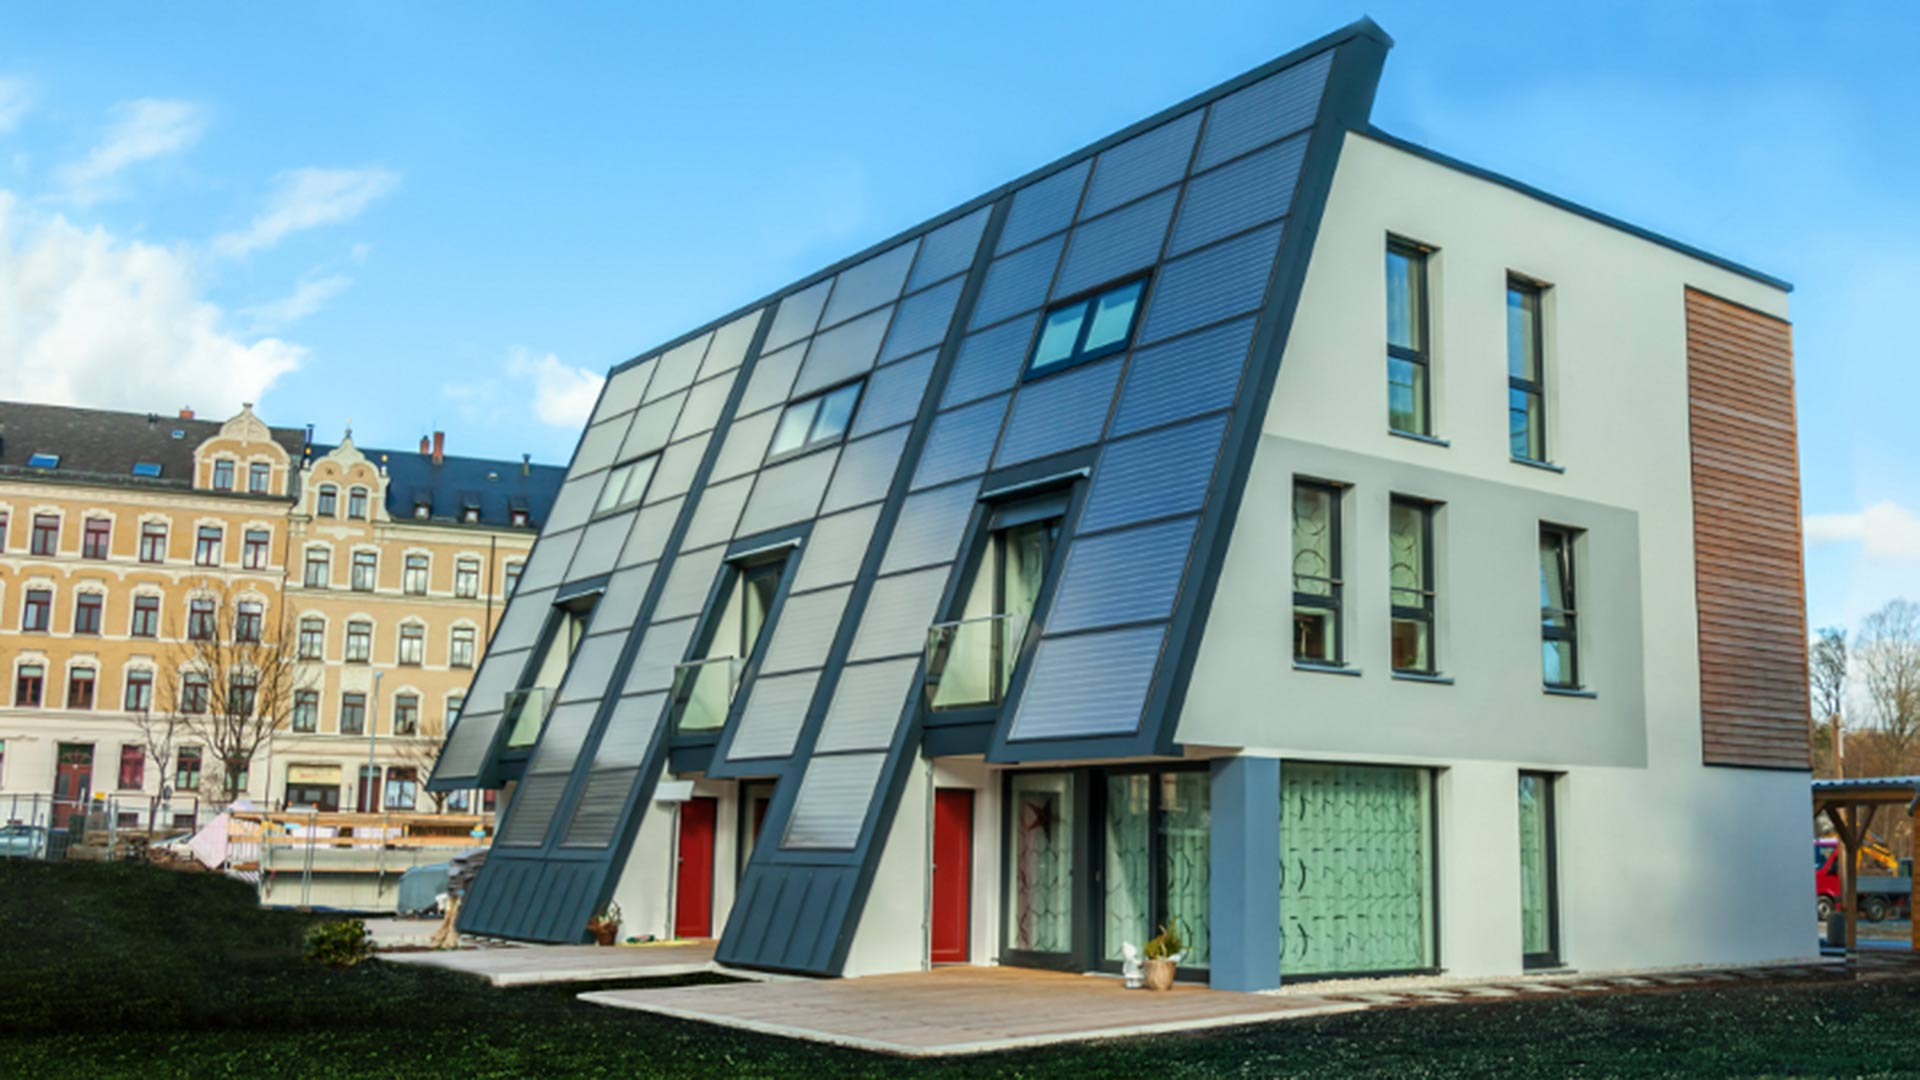 ENERGETIKhaus100® urban in Sachsen